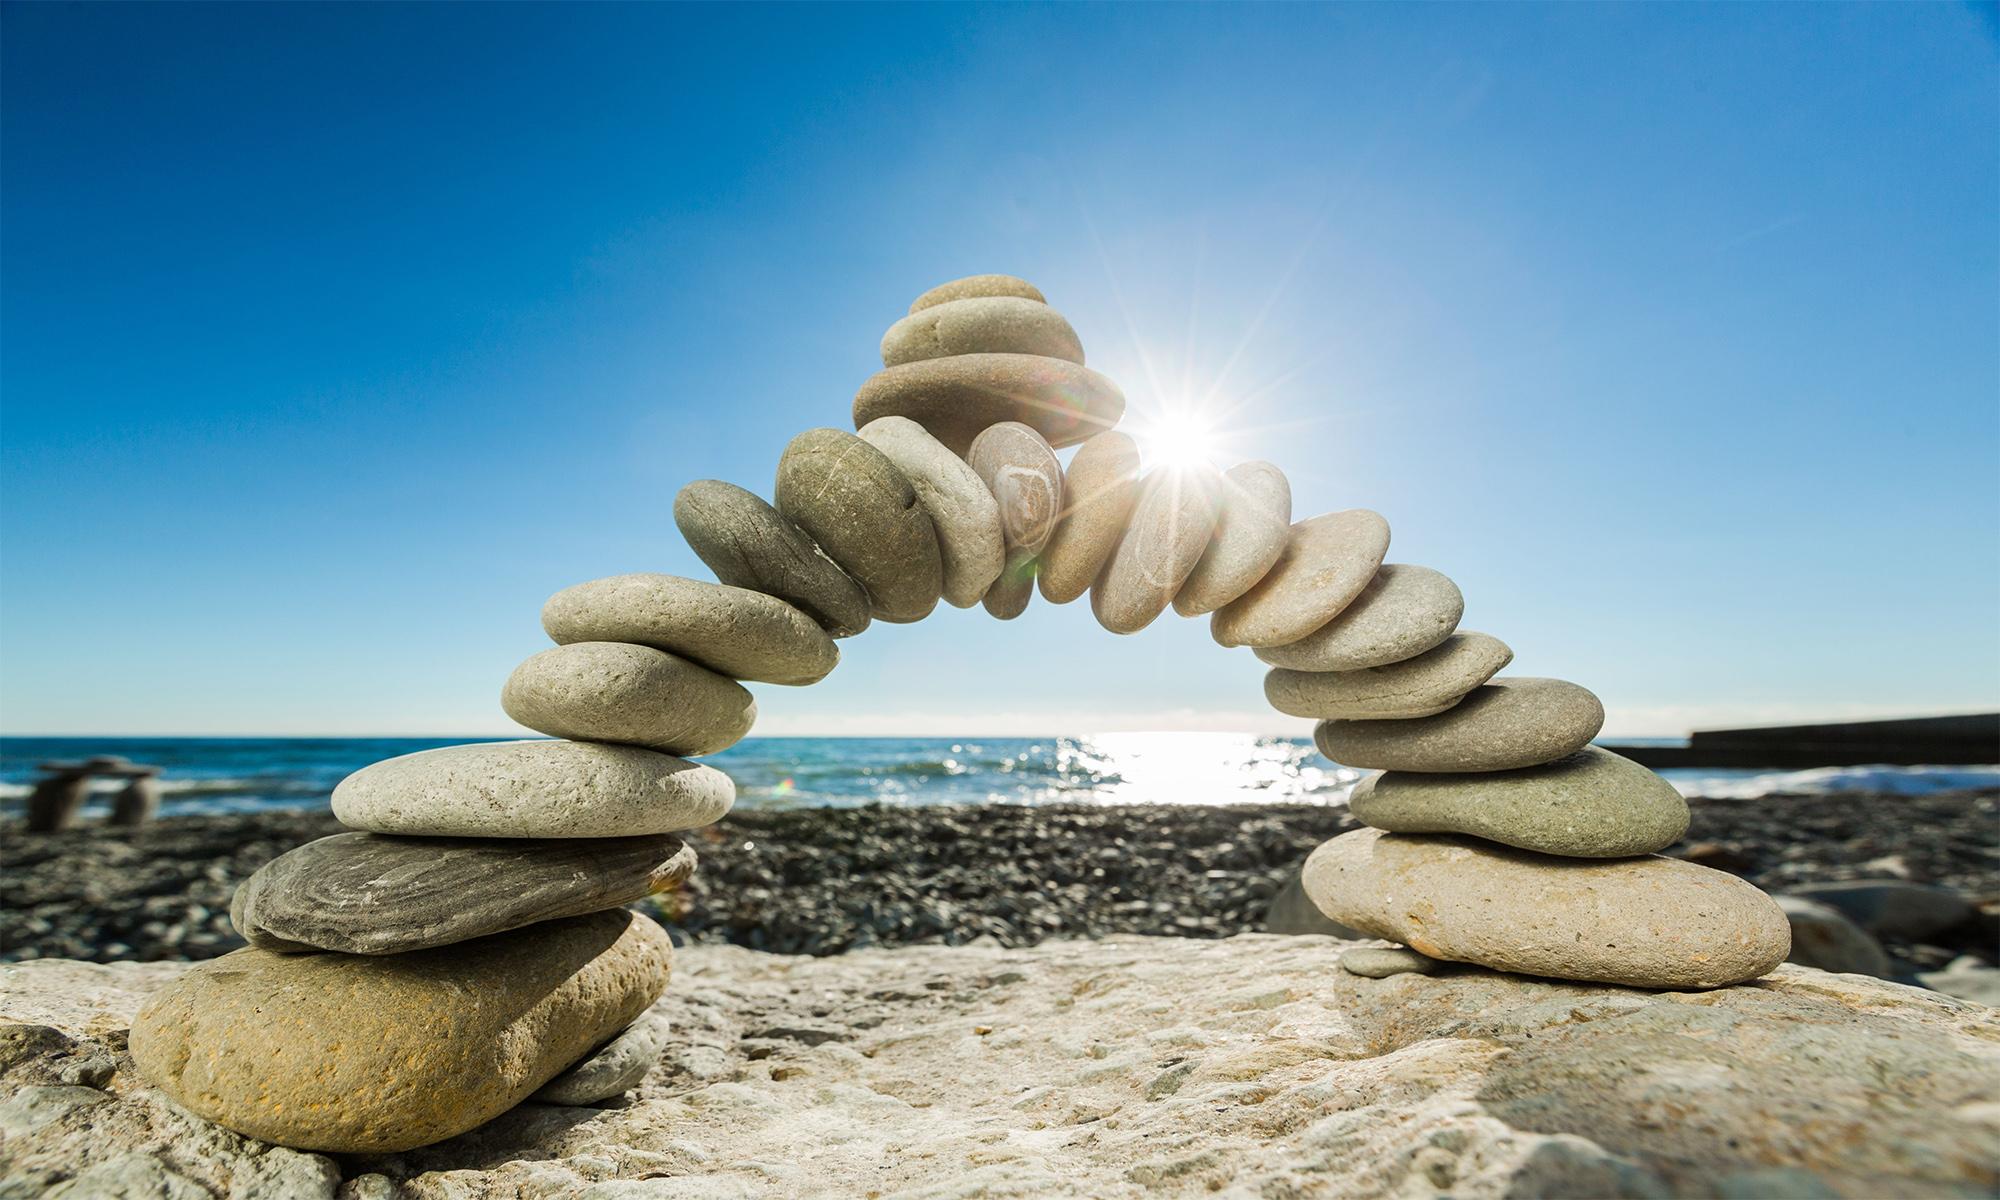 Bridge made of stones